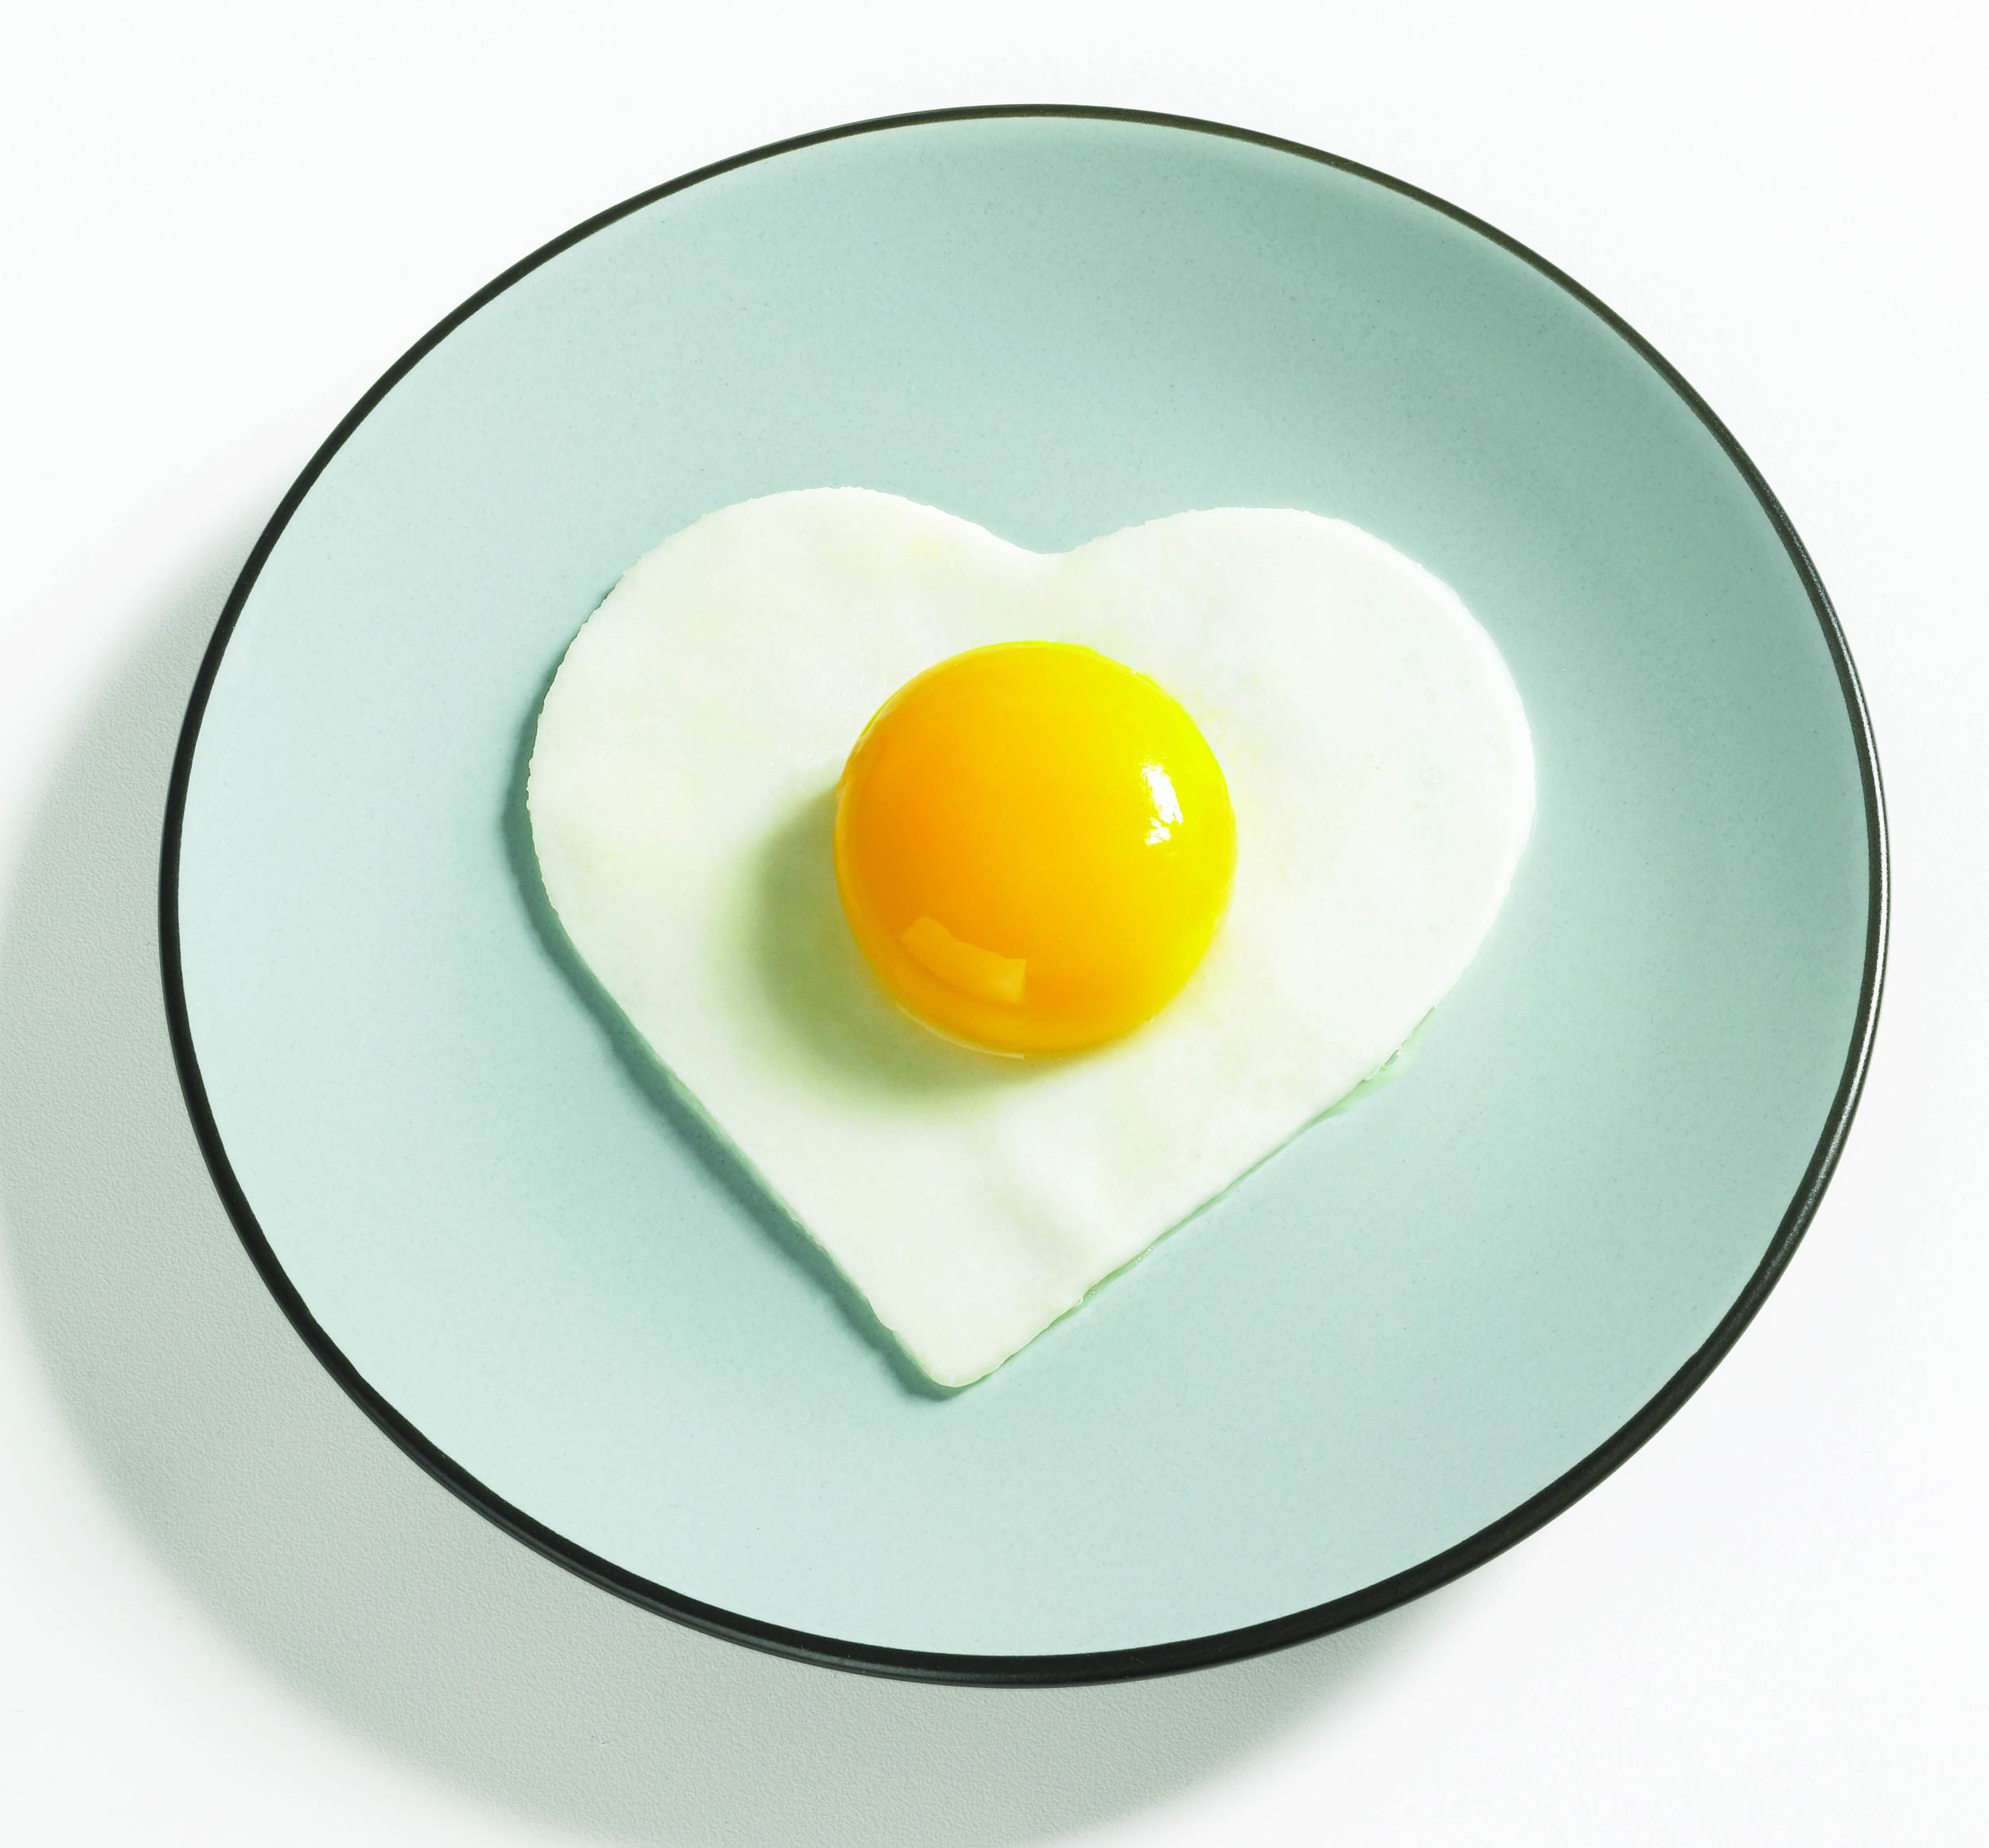 colesterol saudável